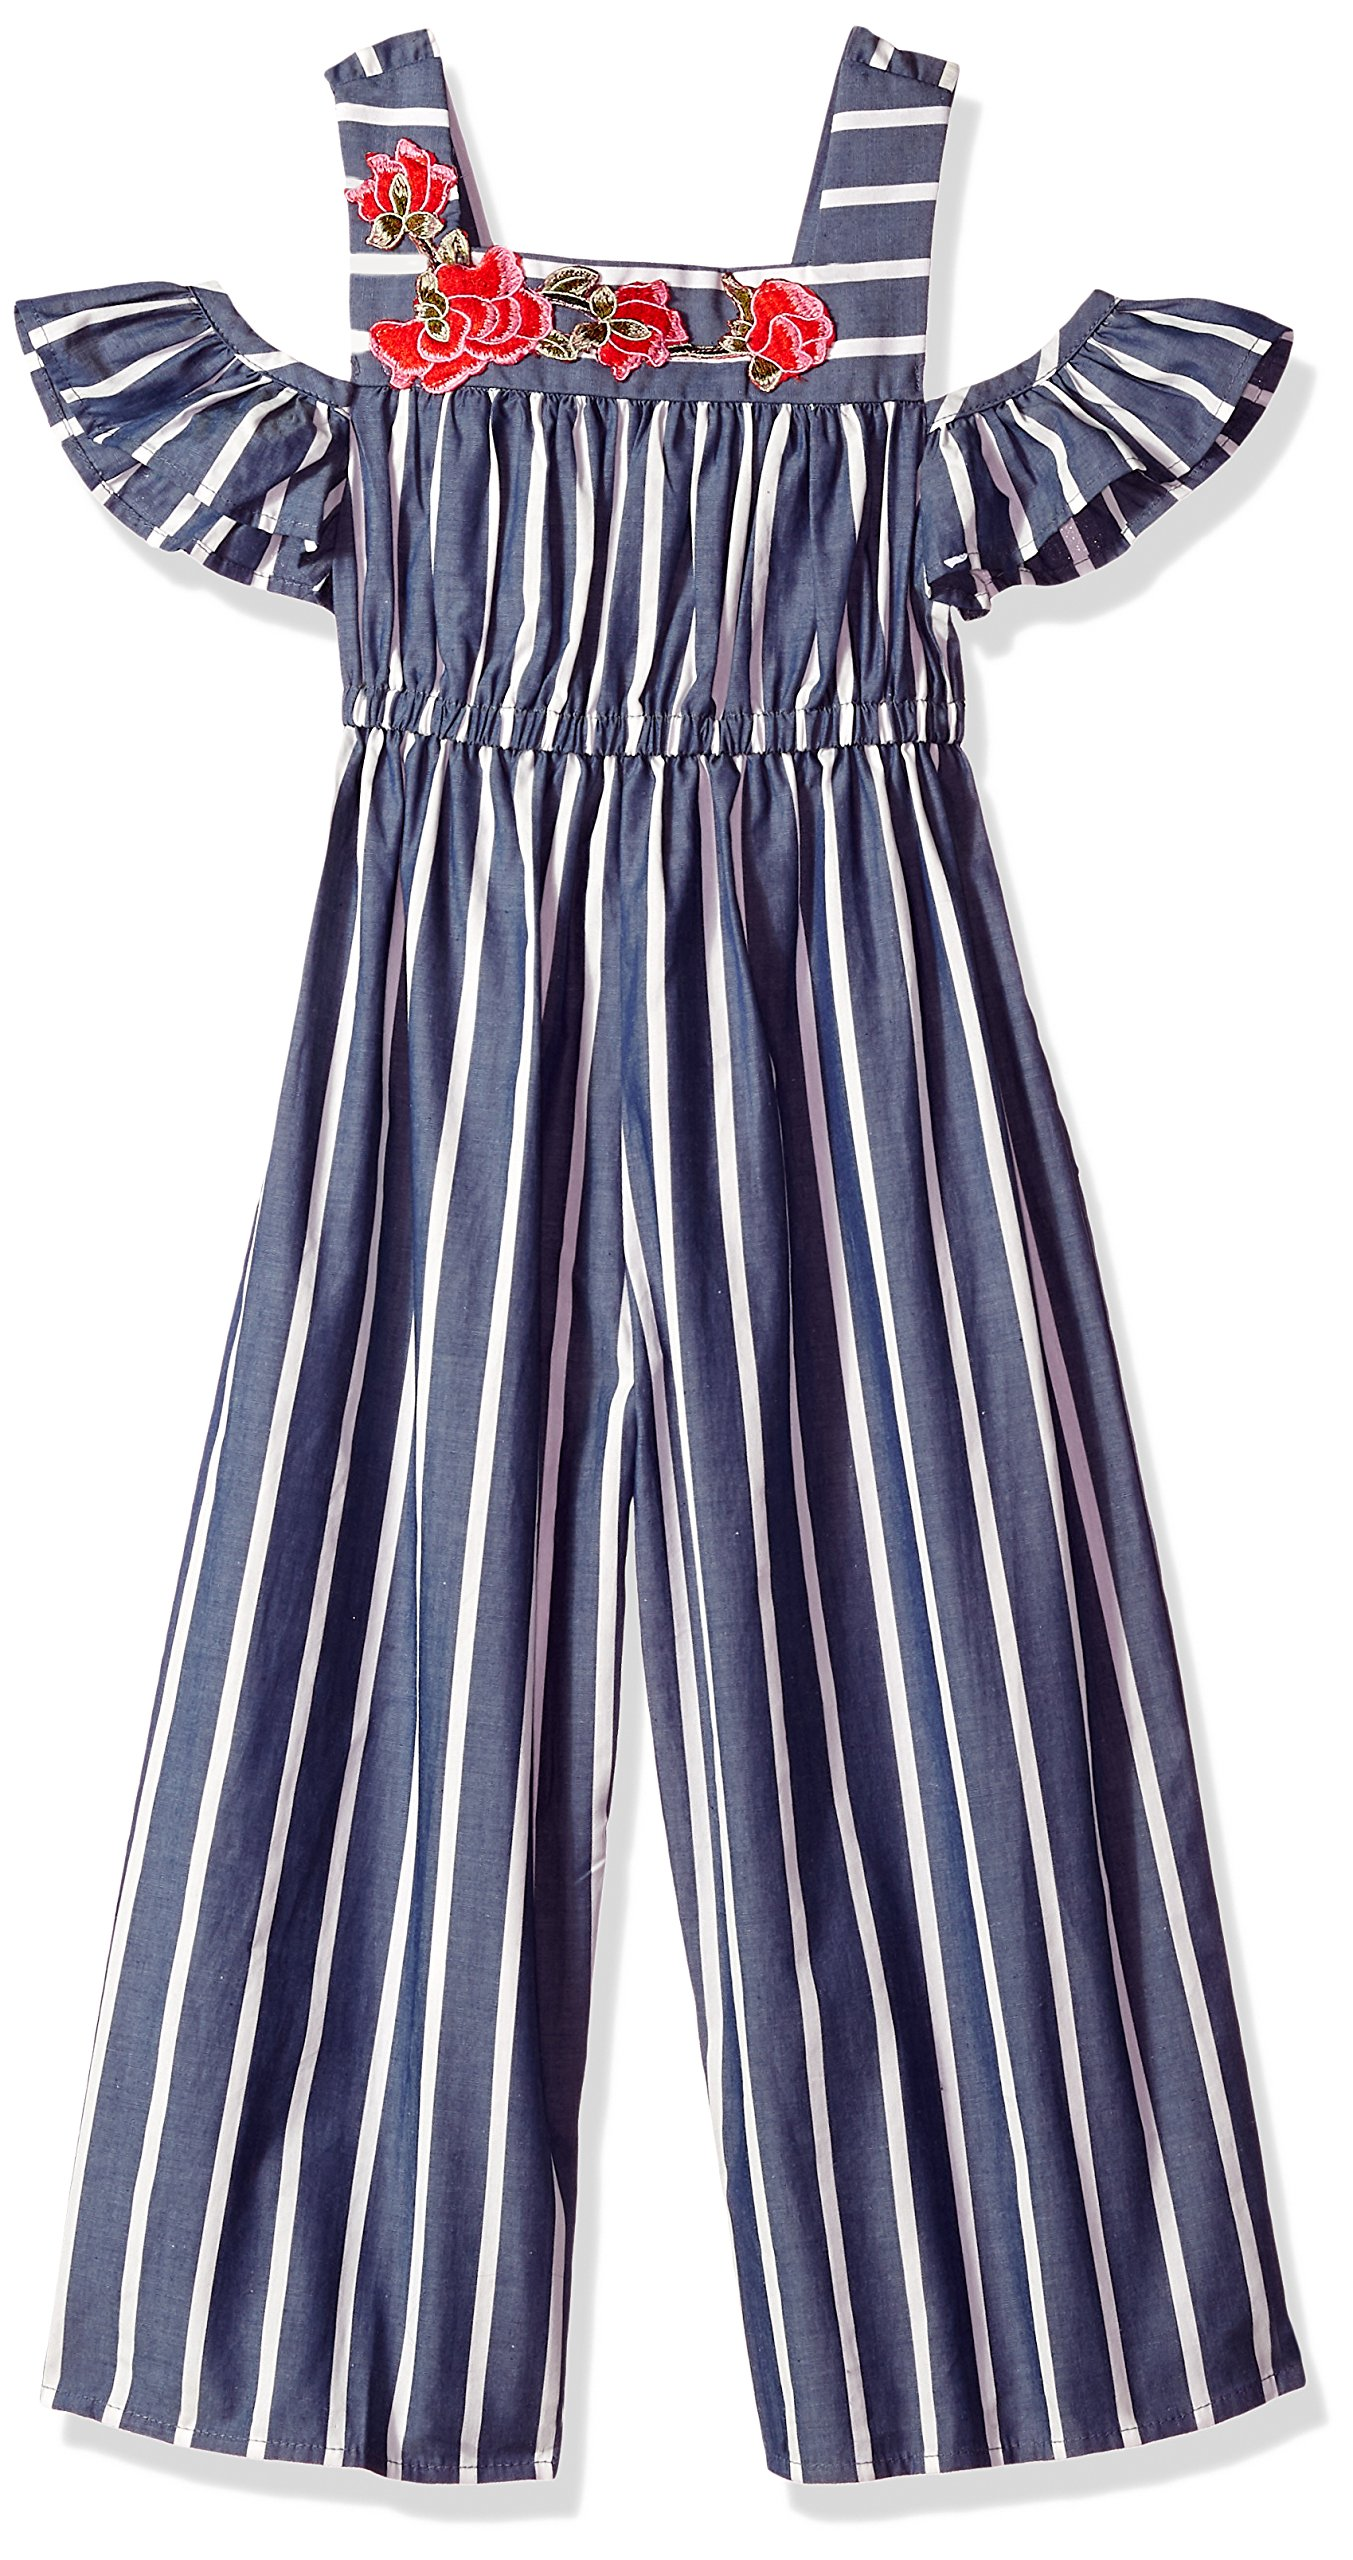 Bonnie Jean Girls' Big Jumpsuit, Blue Stripe, 7